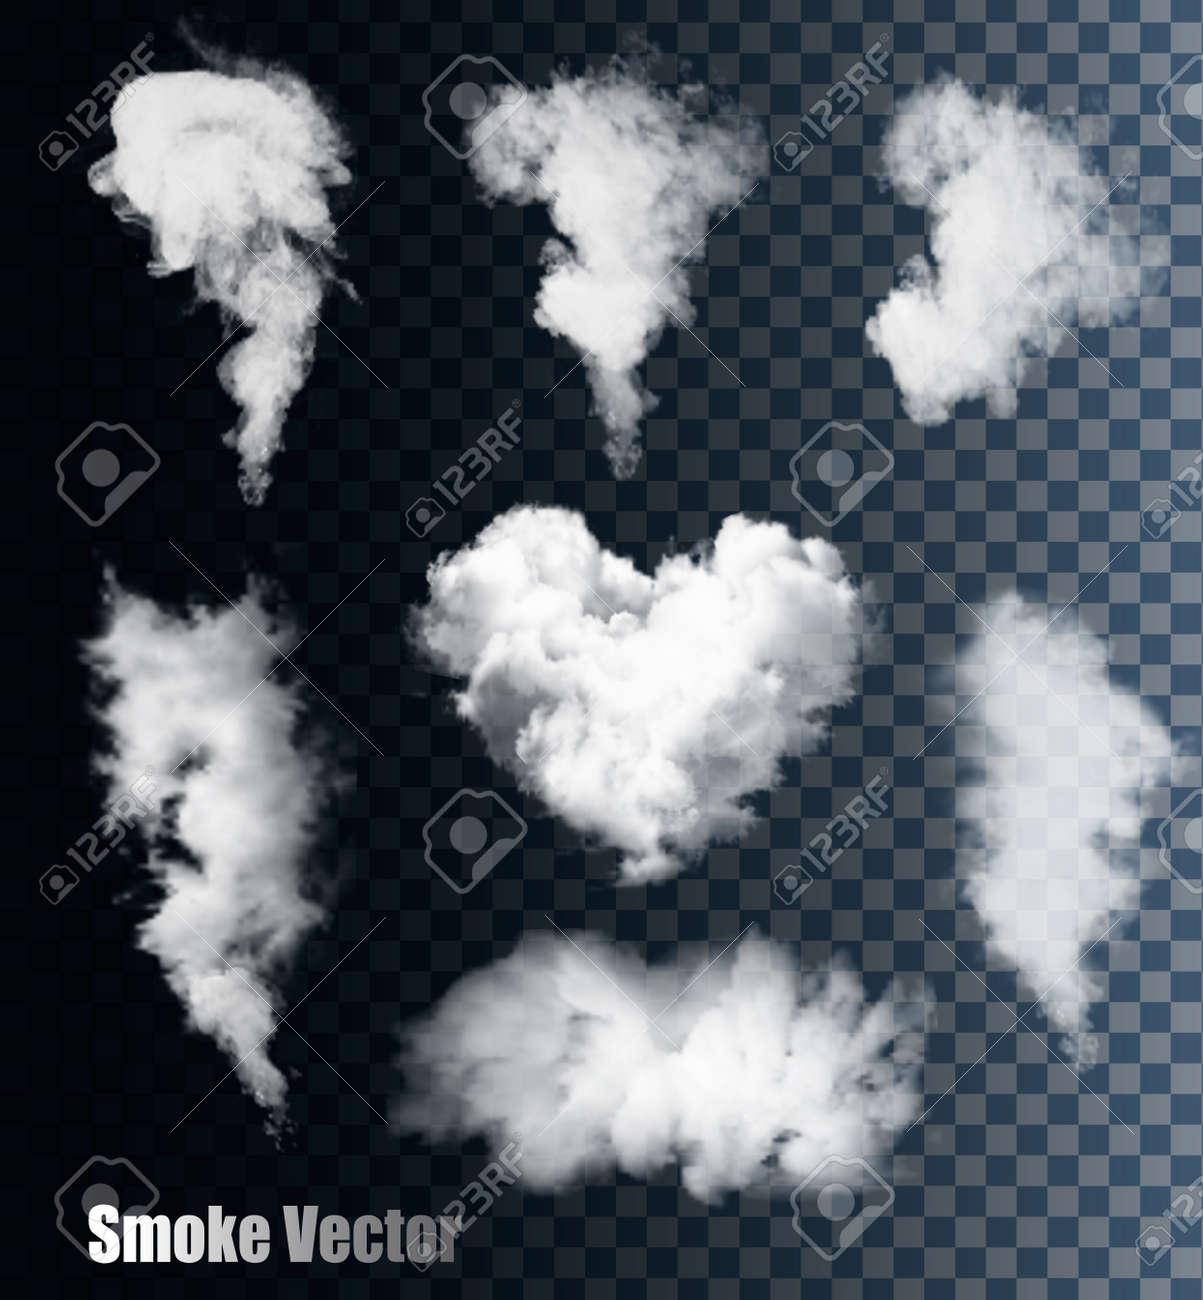 smoke vectors on transparent background stock vector 41314983